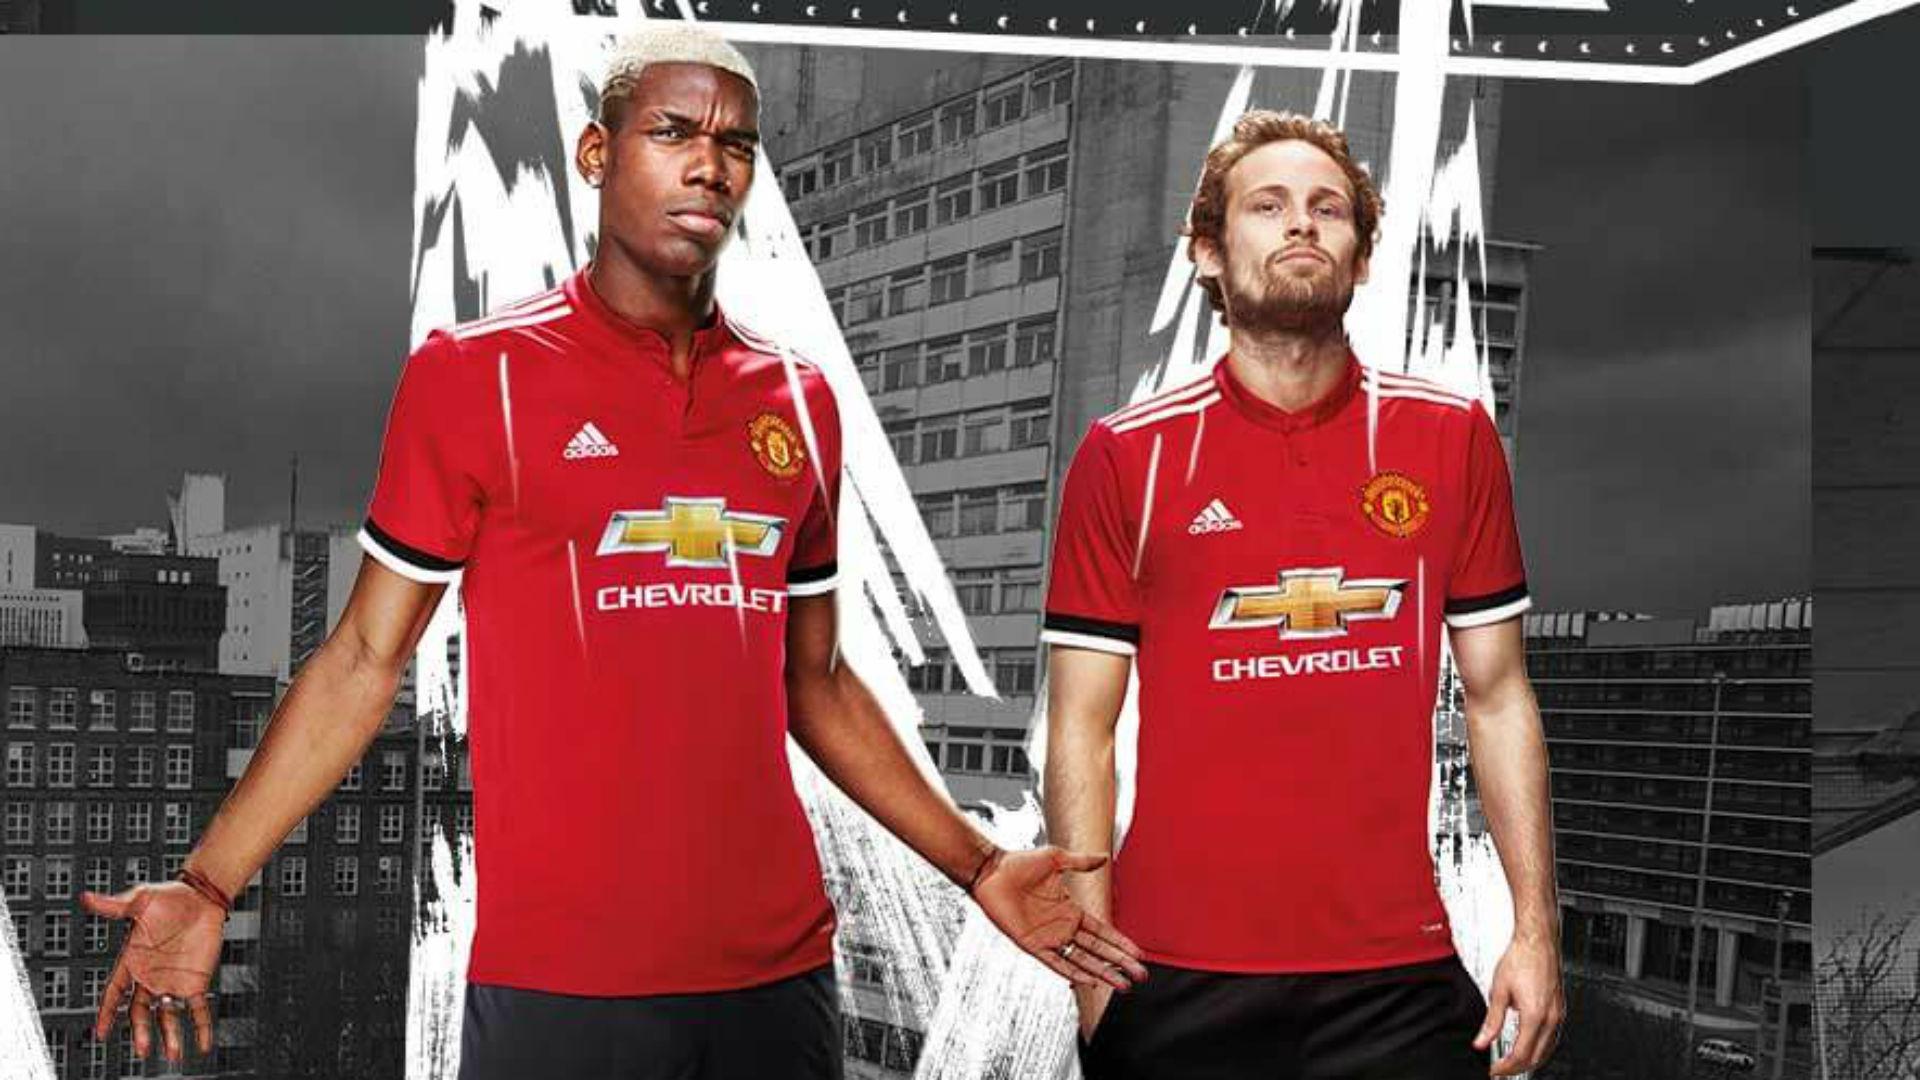 Manchester United 2017-18 home kit